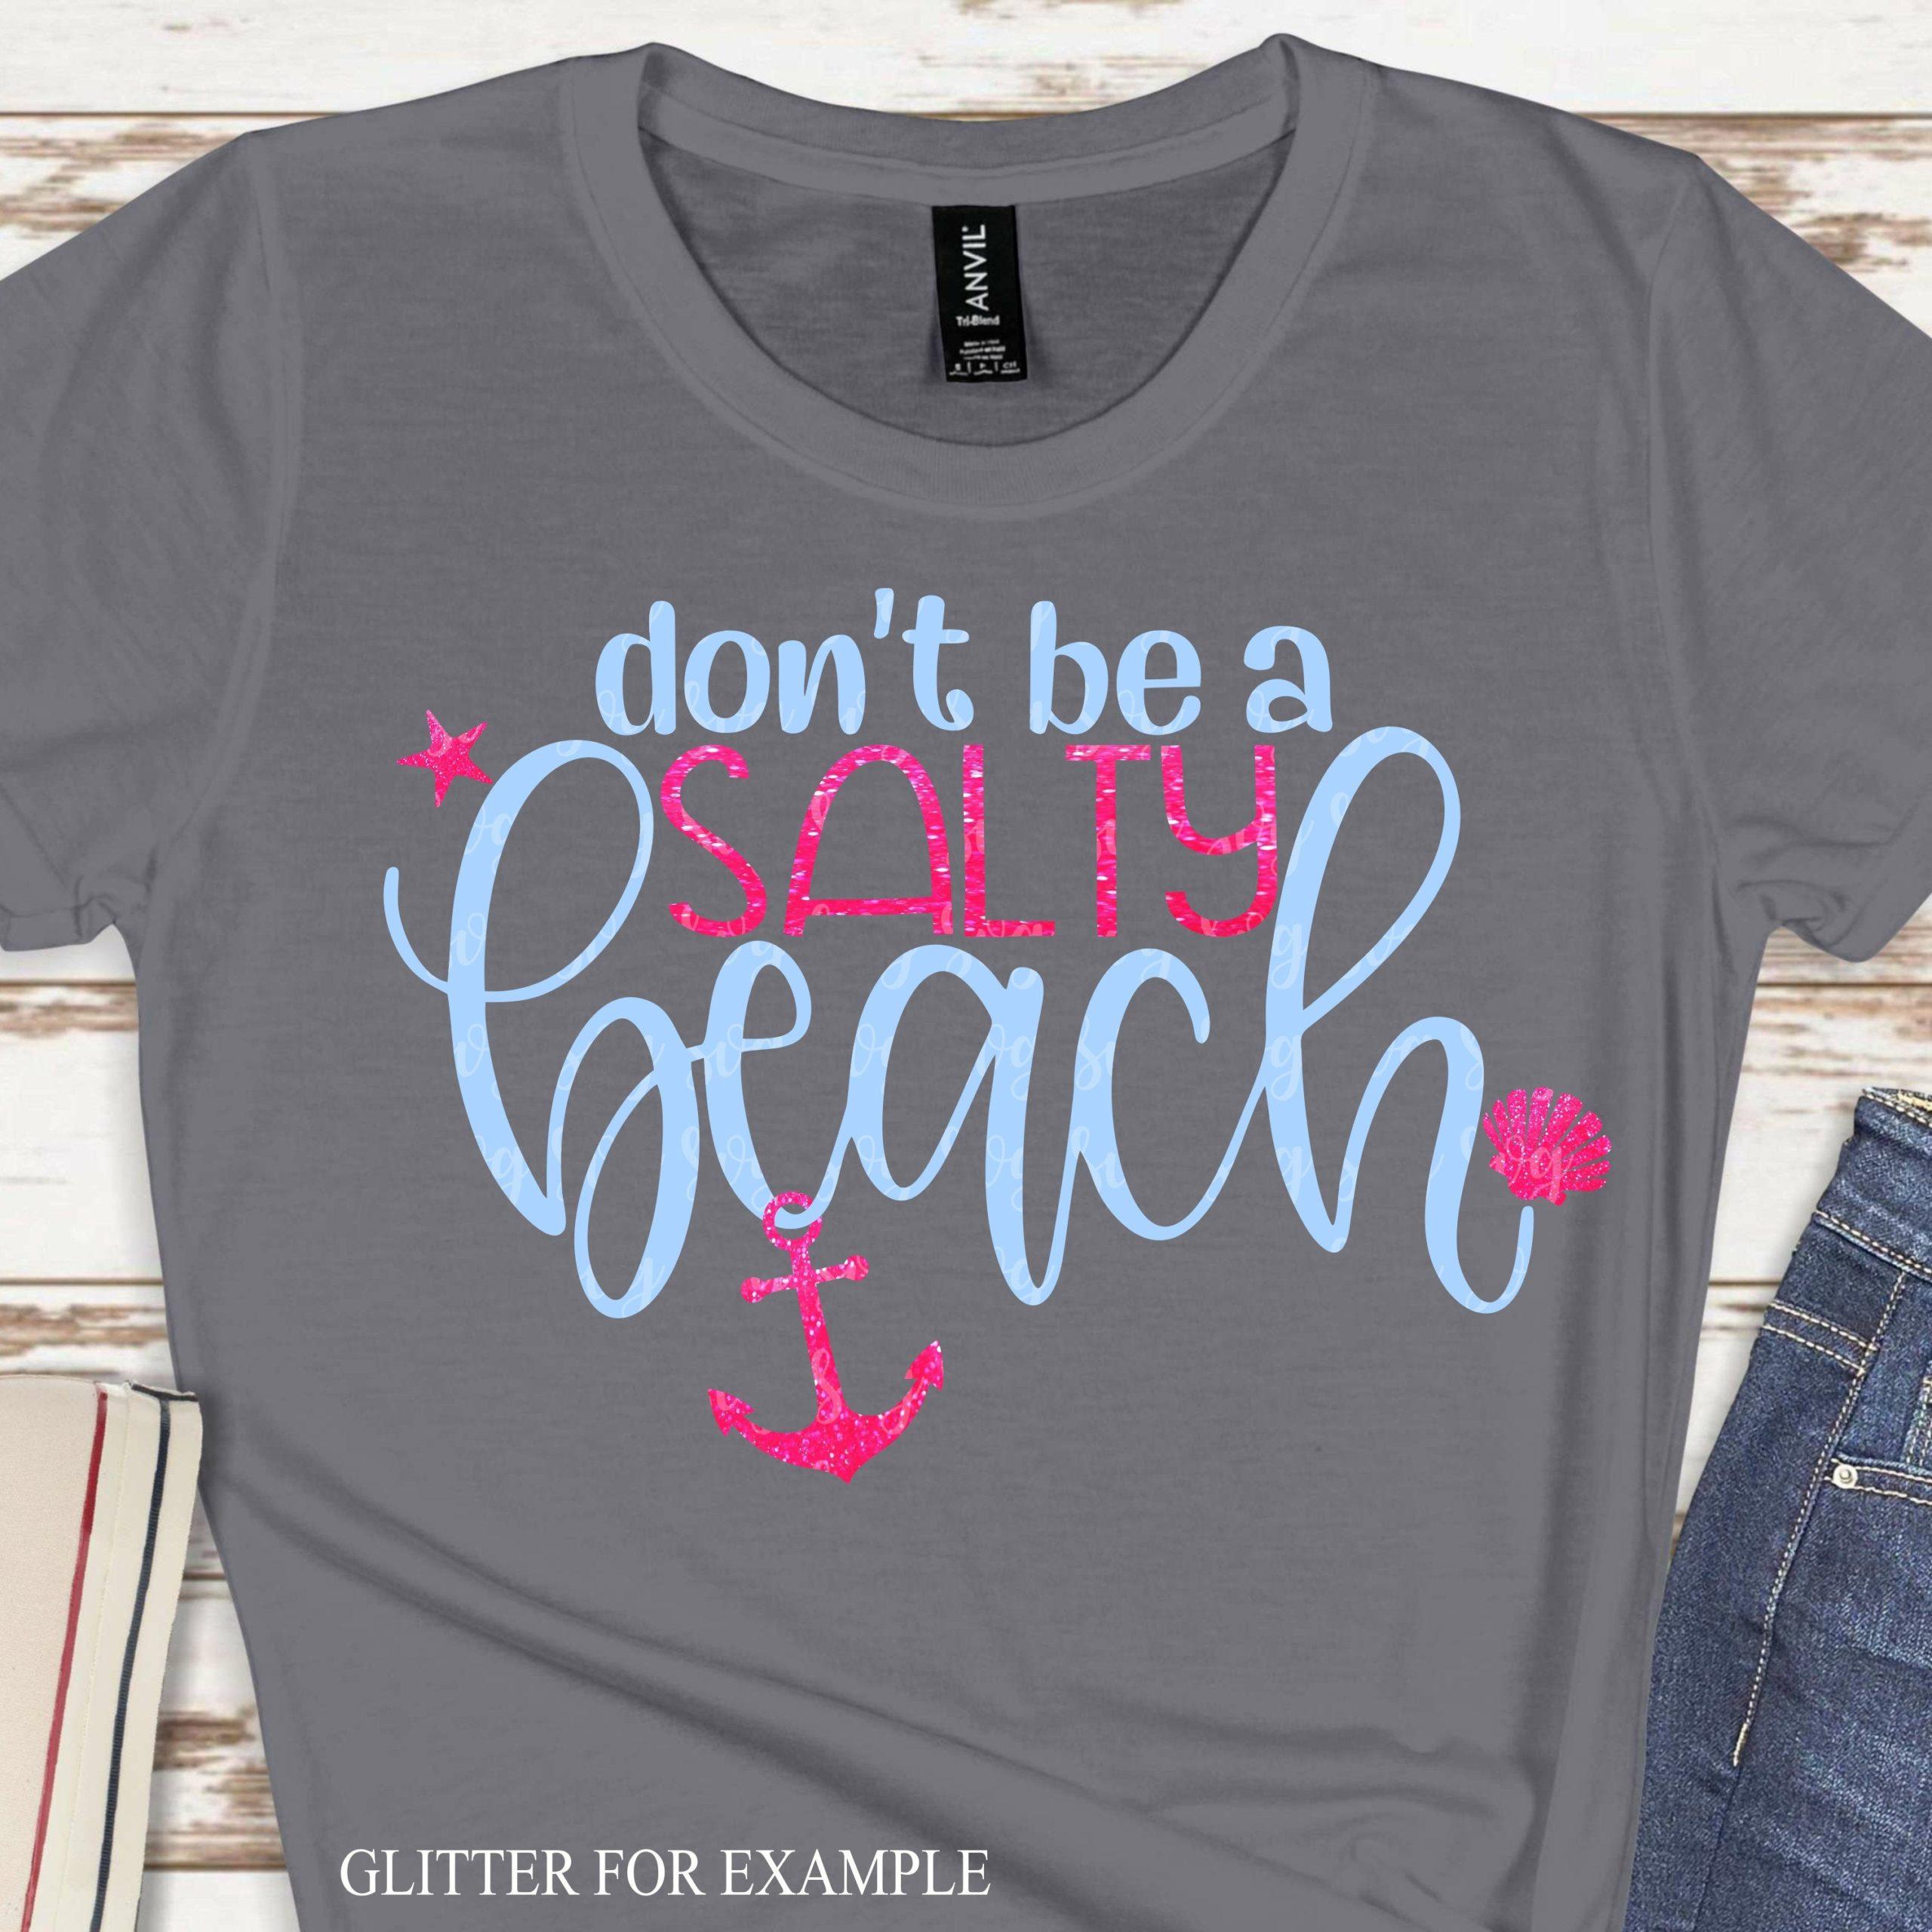 Dont-be-a-salty-beach-svg-beach-svg-palm-tree-svg-summer-svg-summertime-svgbeach-life-svg-beachy-svg-for-cricut-retro-beach-svg-5ef78d8c